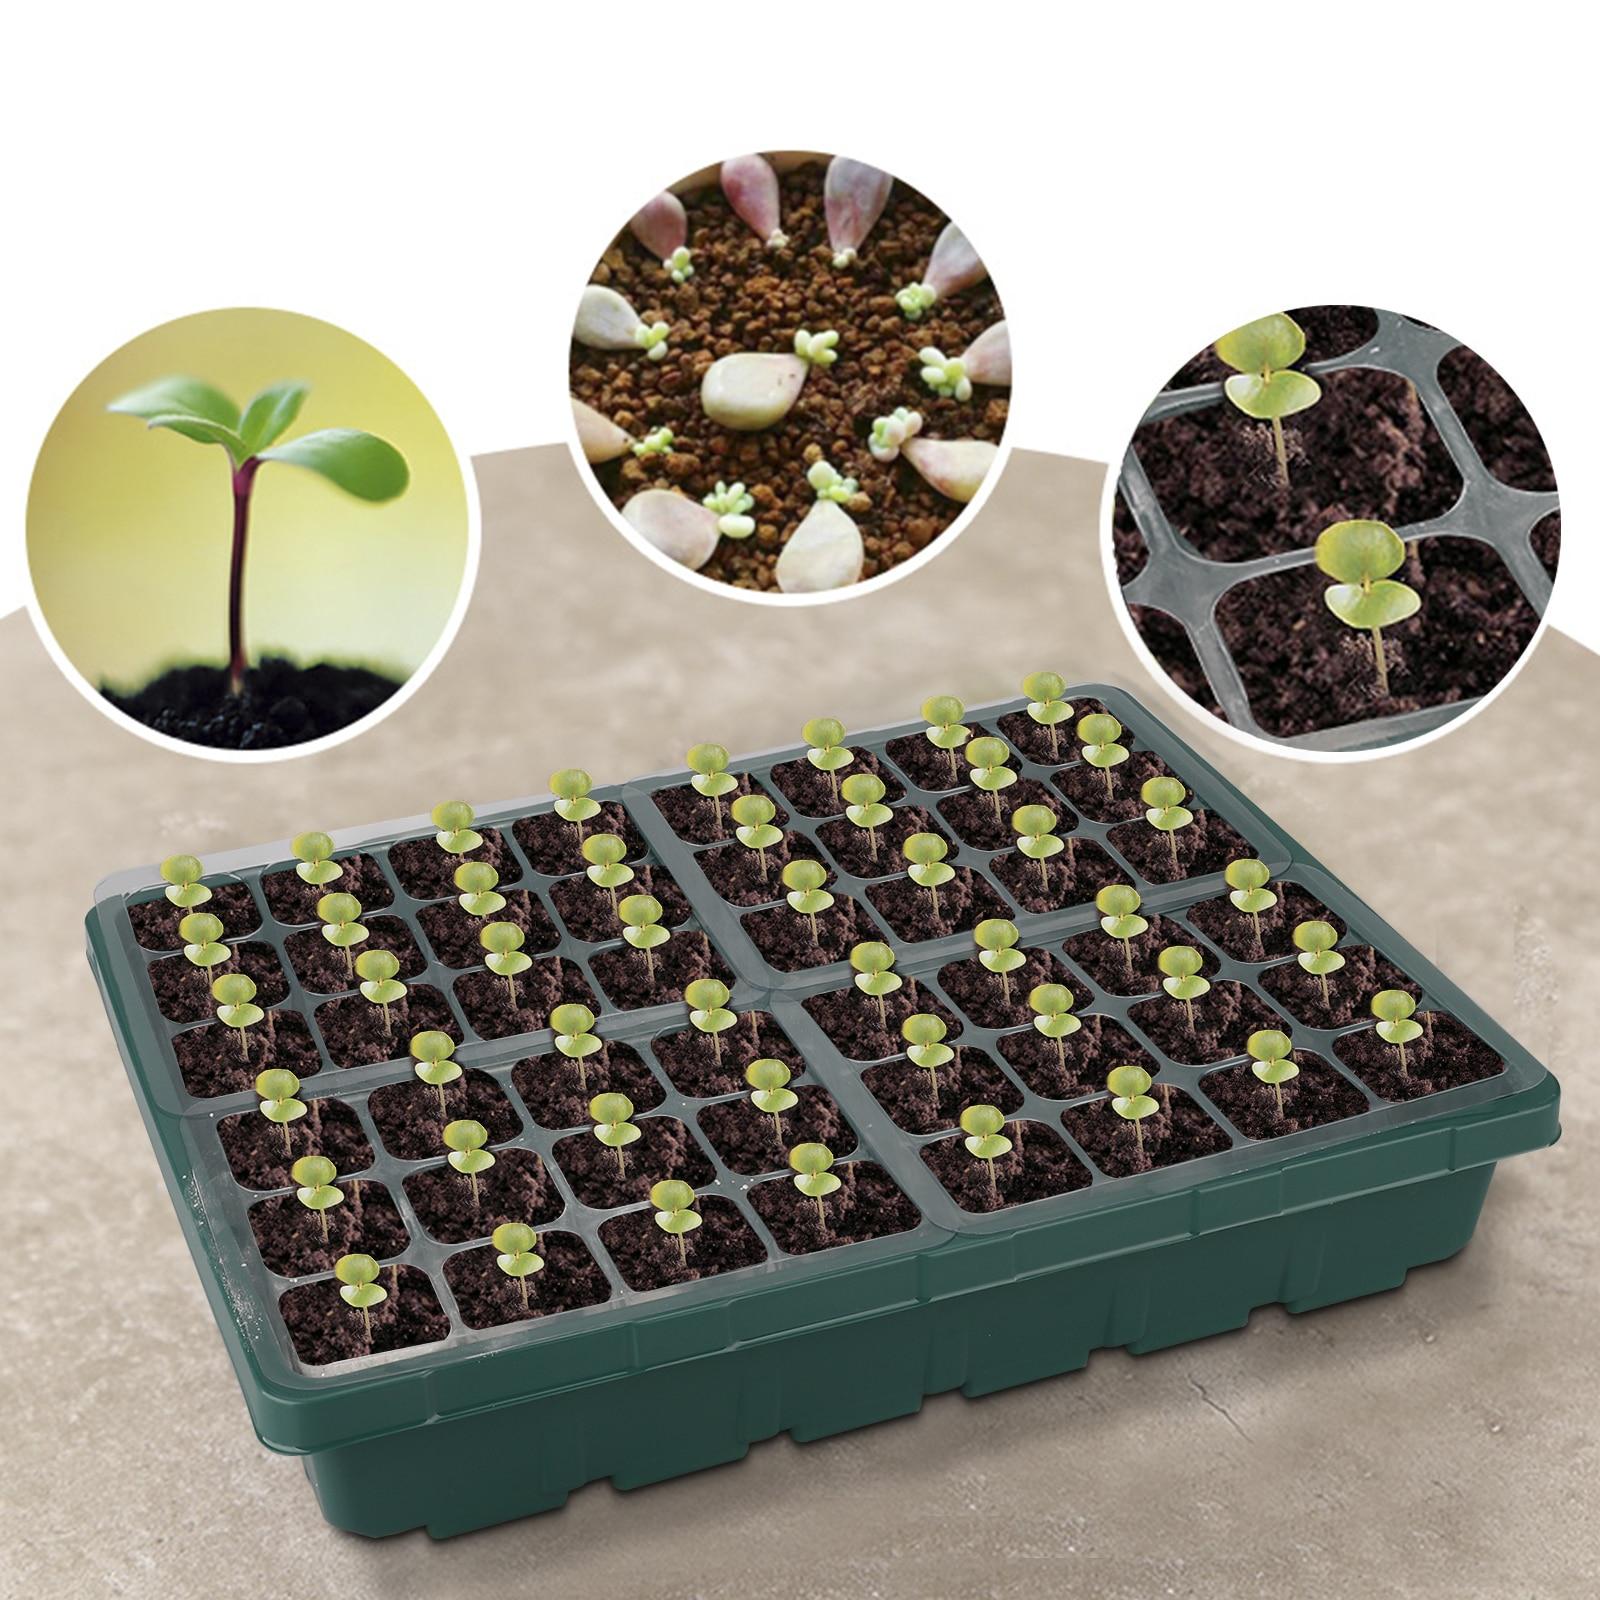 48 клетки сад растение горшок семена сад сад макета растение семена ростки ящик питомник саженец закваска сад двор саженец лоток